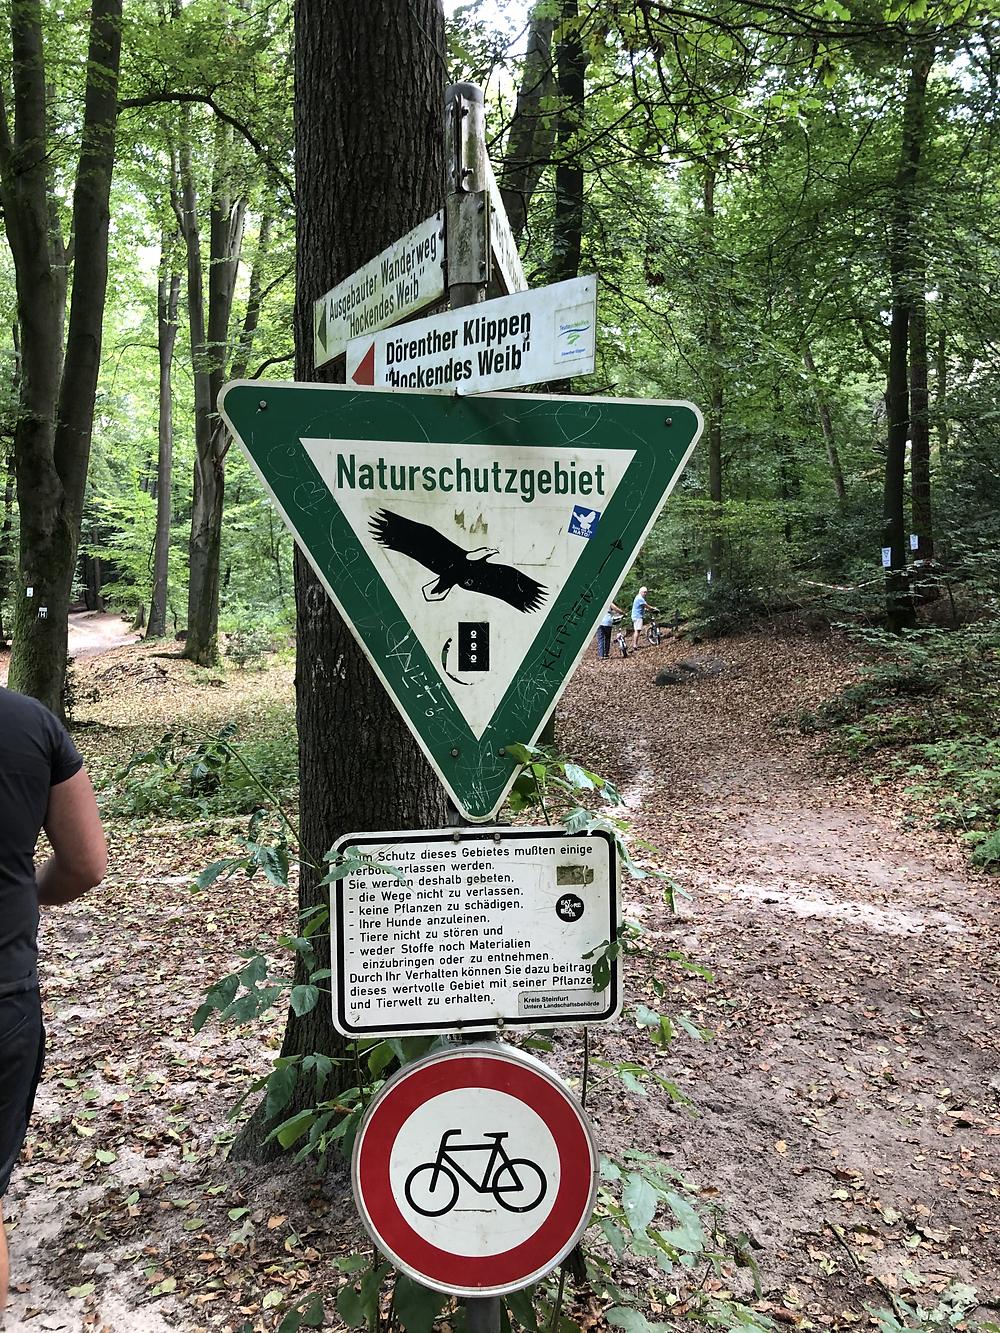 Dörenther-klippen-wandern-münsterland-ibbenbüren